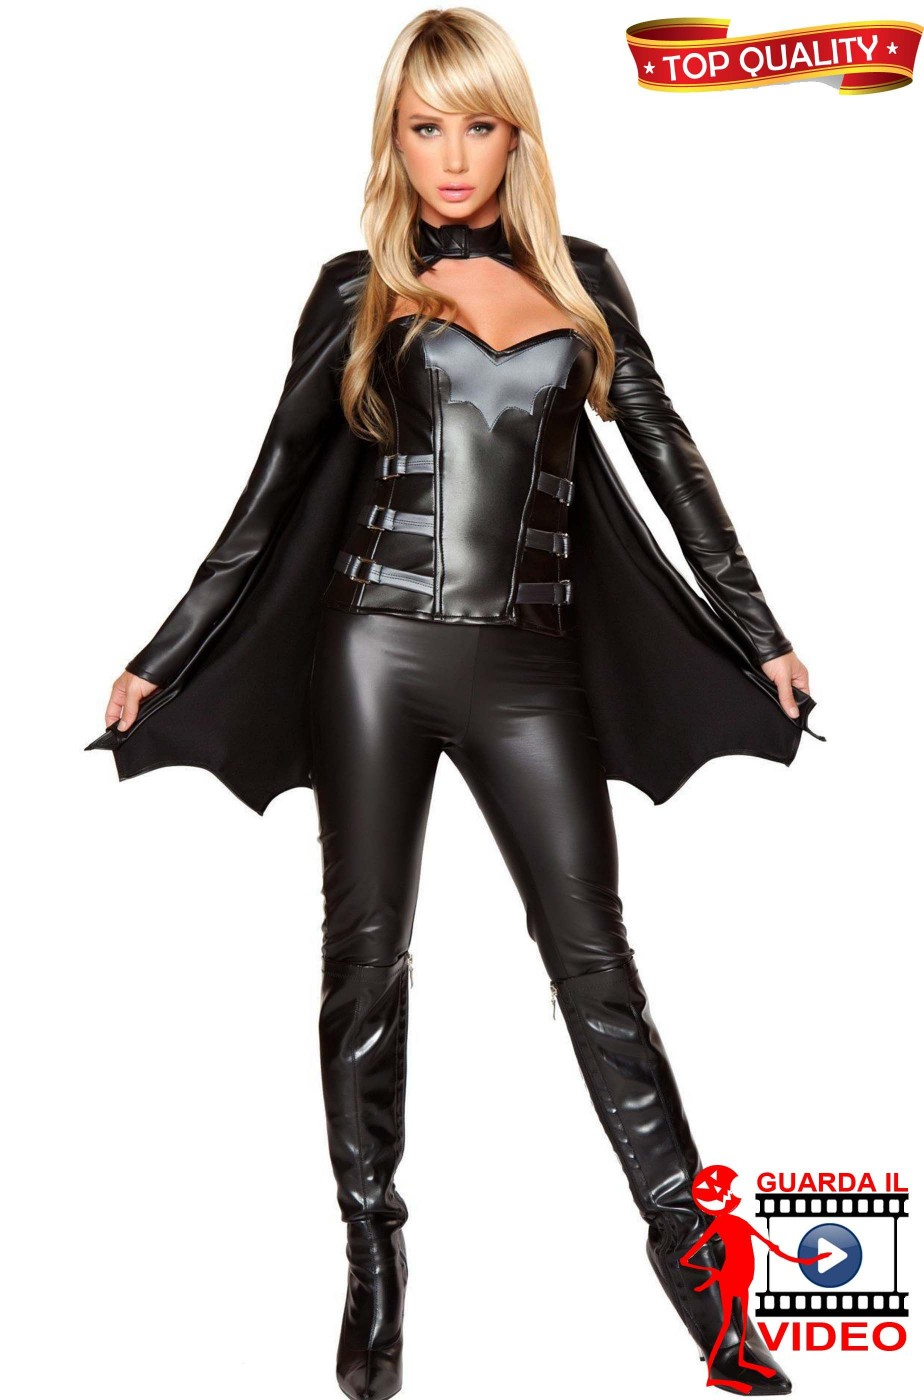 Costume bat girl in vinile straordinario e bellissimo